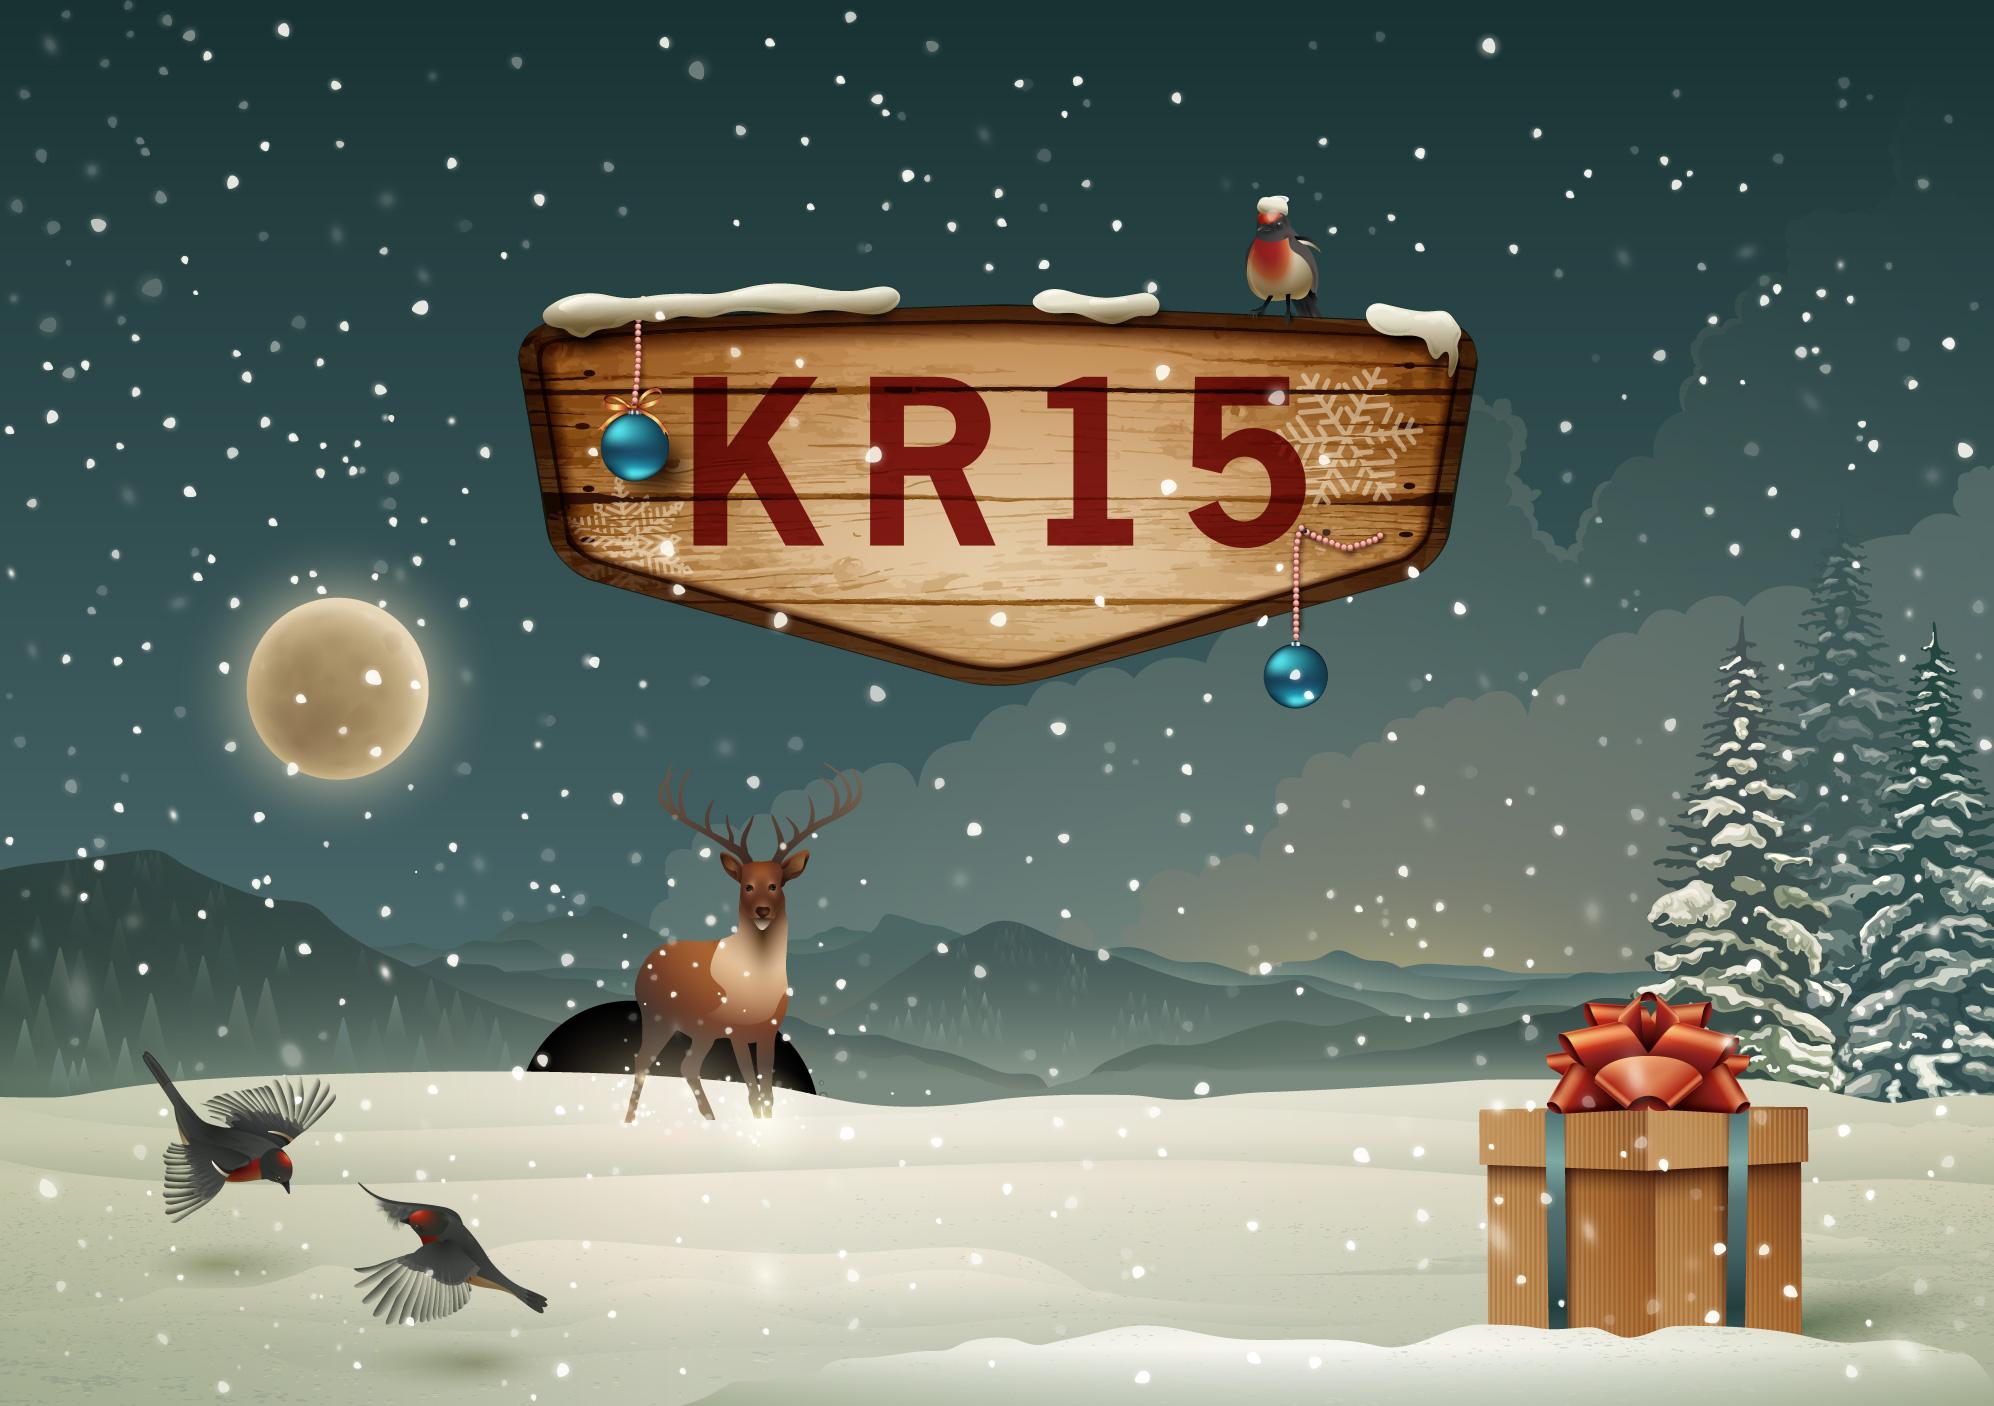 kr15_winter.jpg